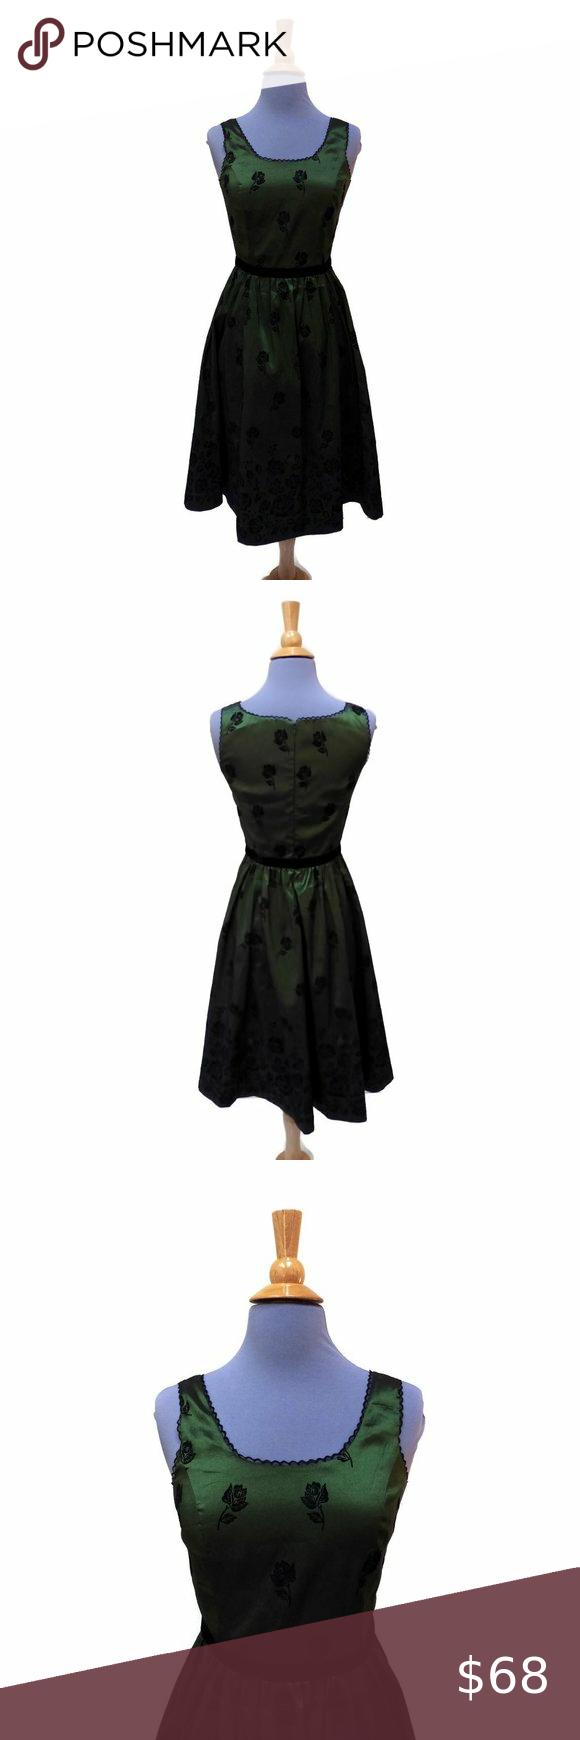 Twilight Bella Swan New Moon Dress Green Taffeta Moon Dress Green Dress Dresses [ 1740 x 580 Pixel ]